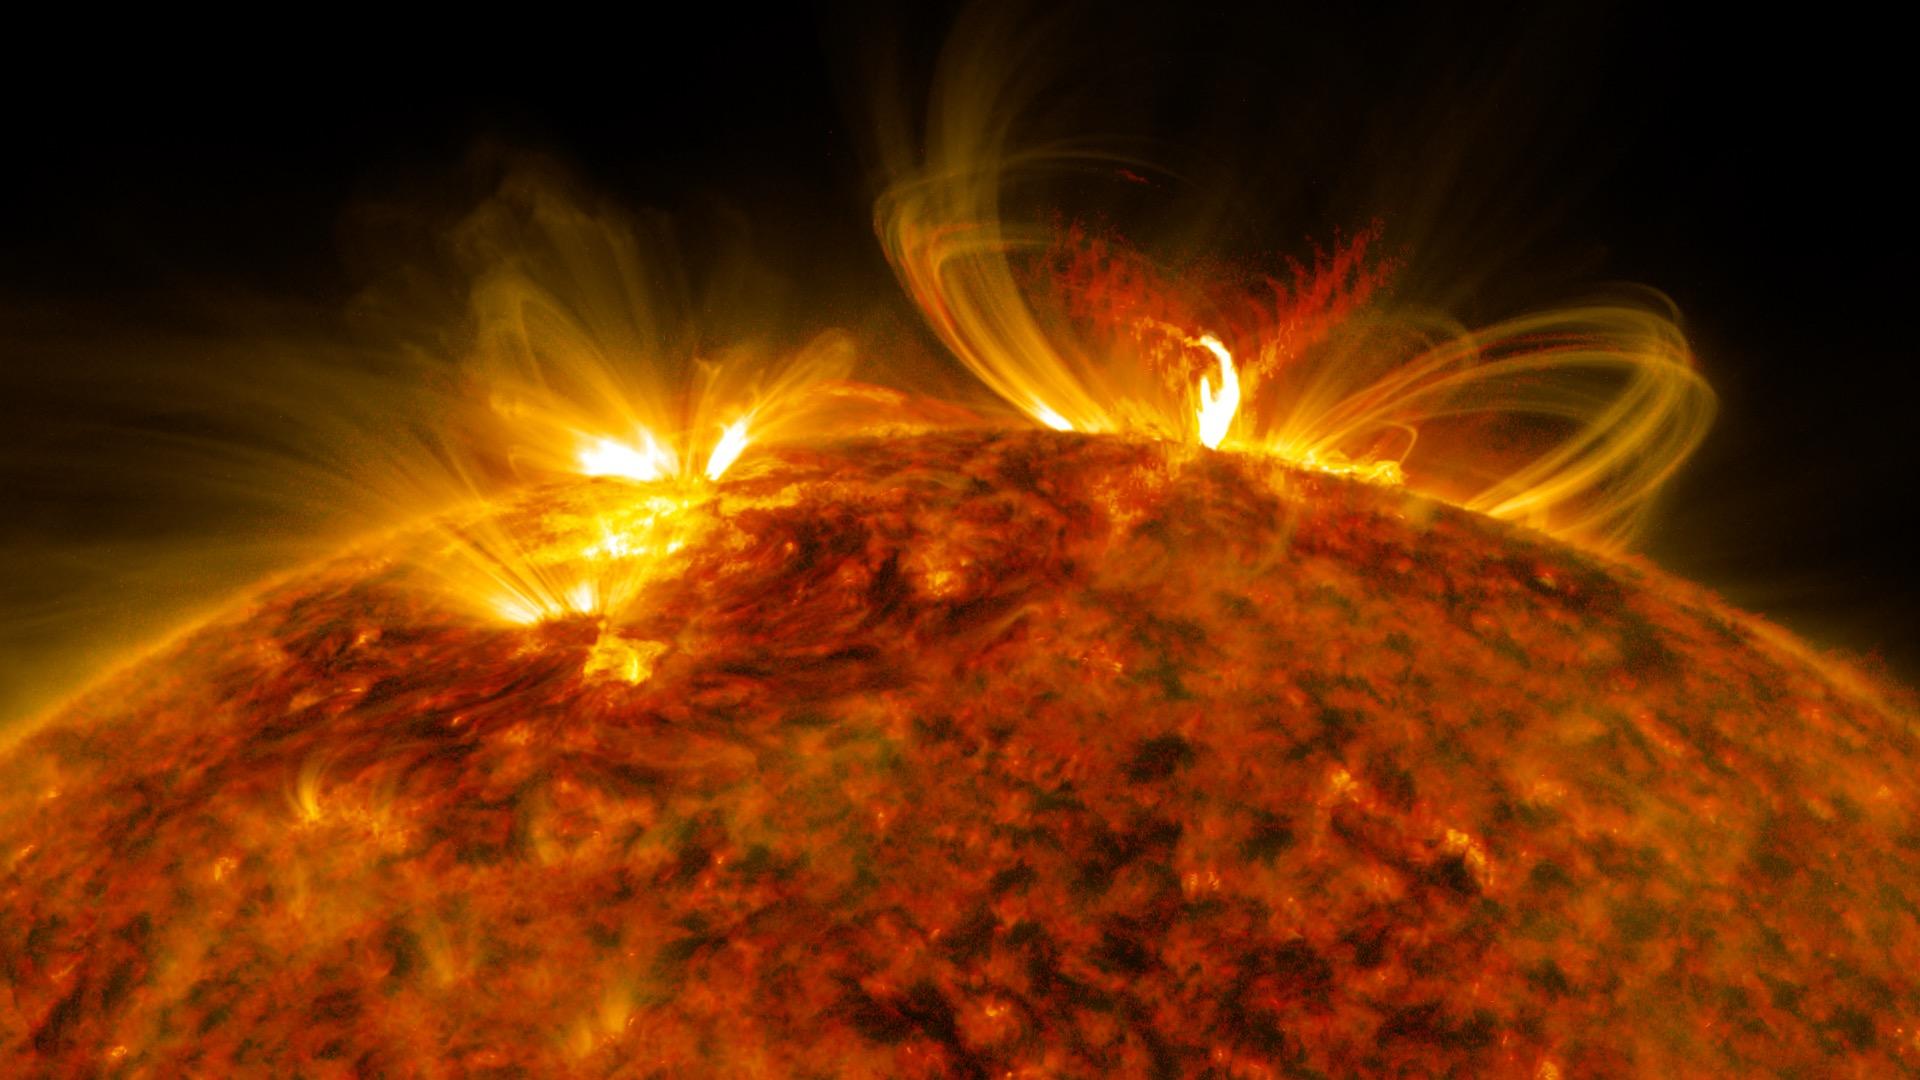 sun system solar flare - photo #25